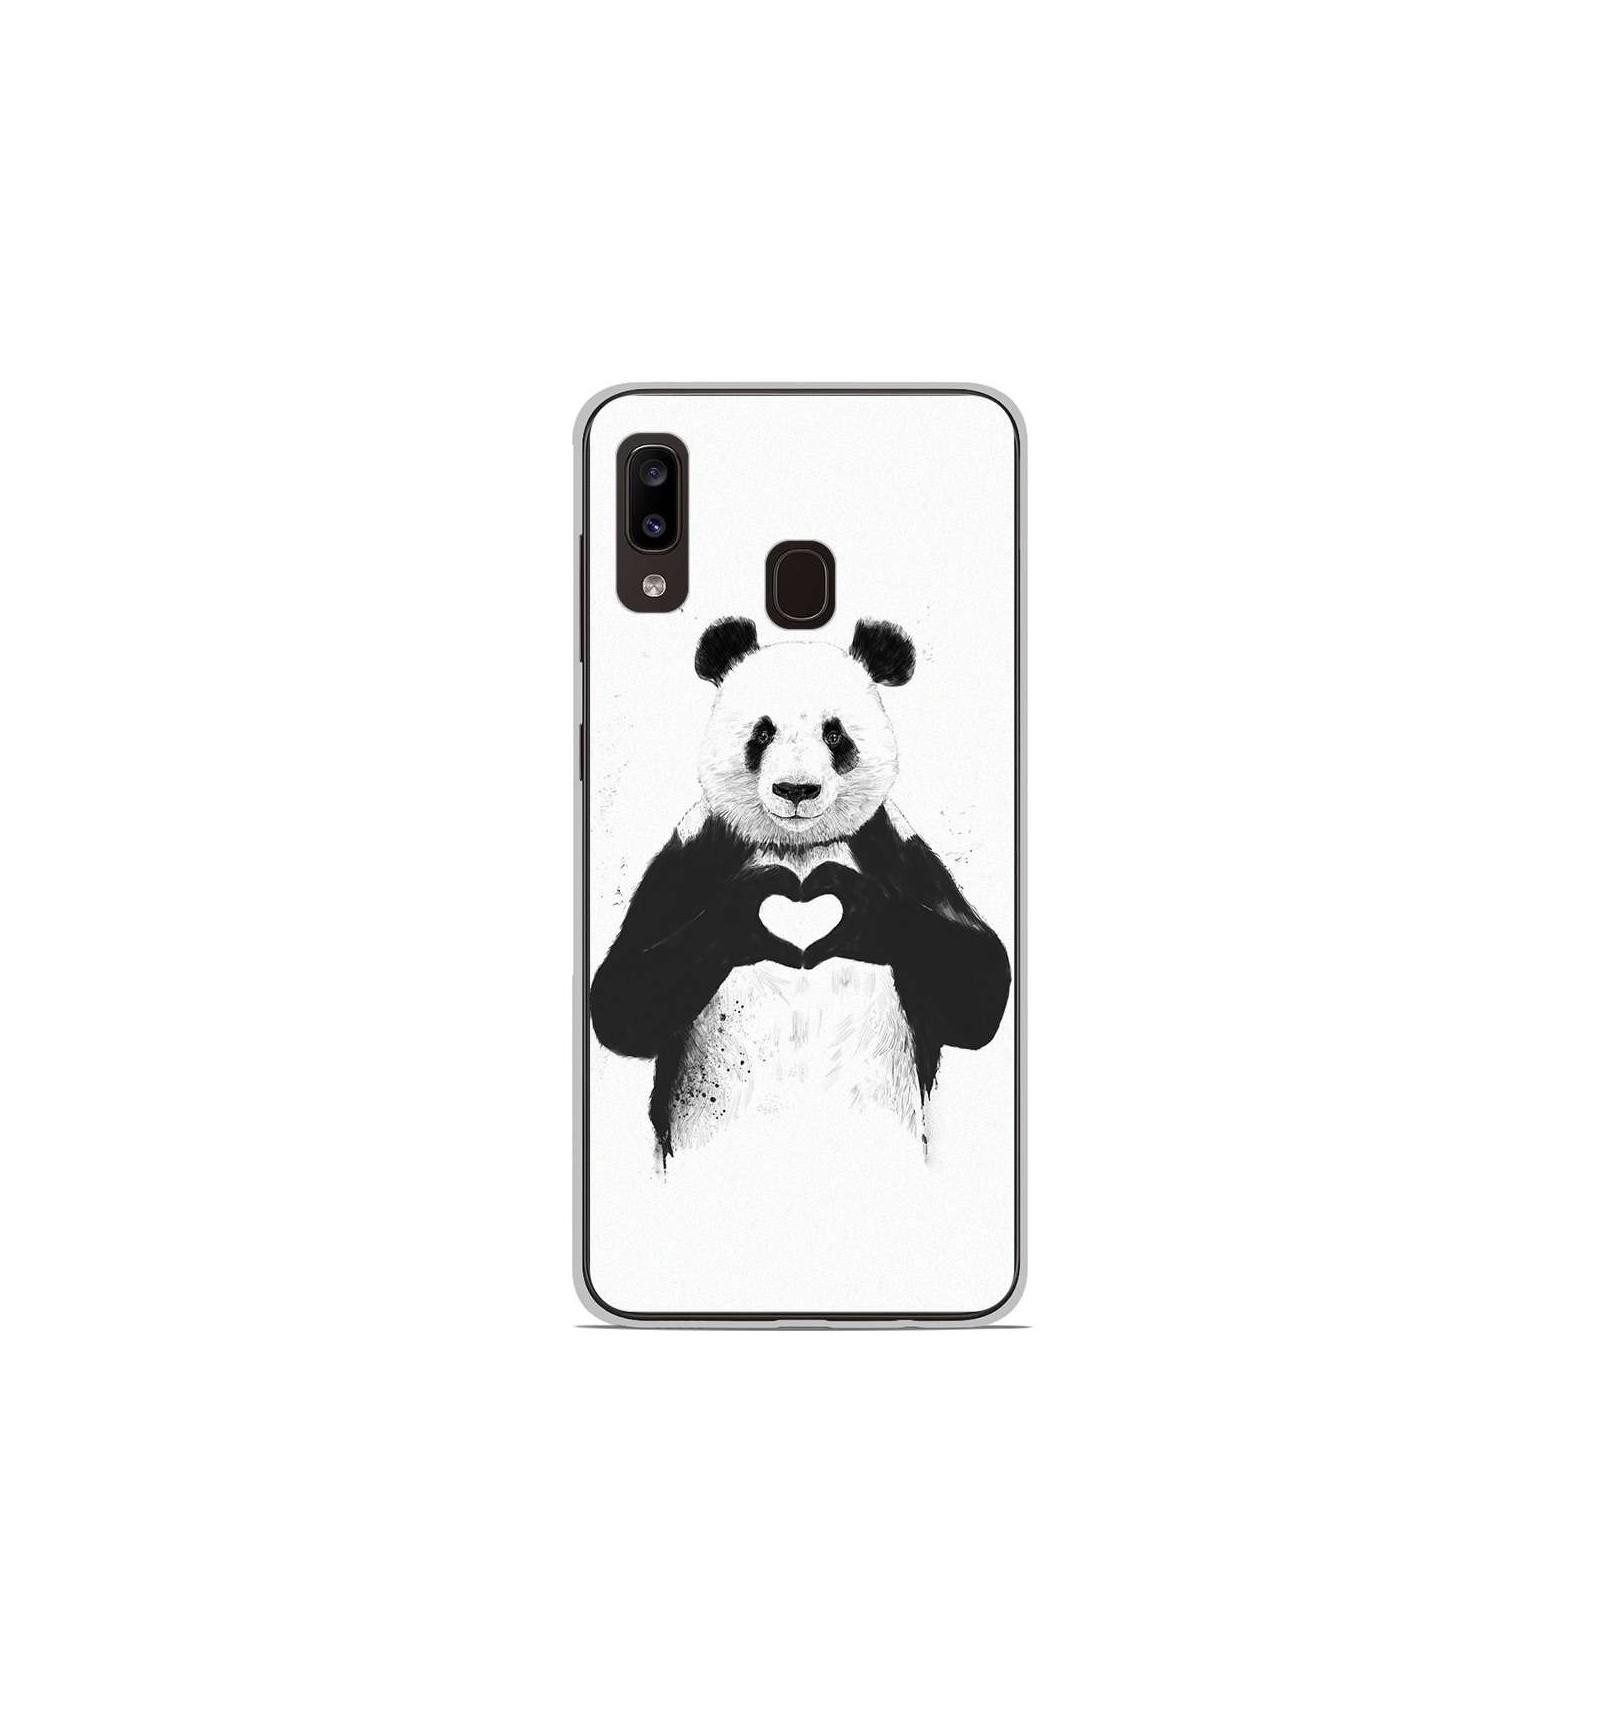 coque samsung a20 panda